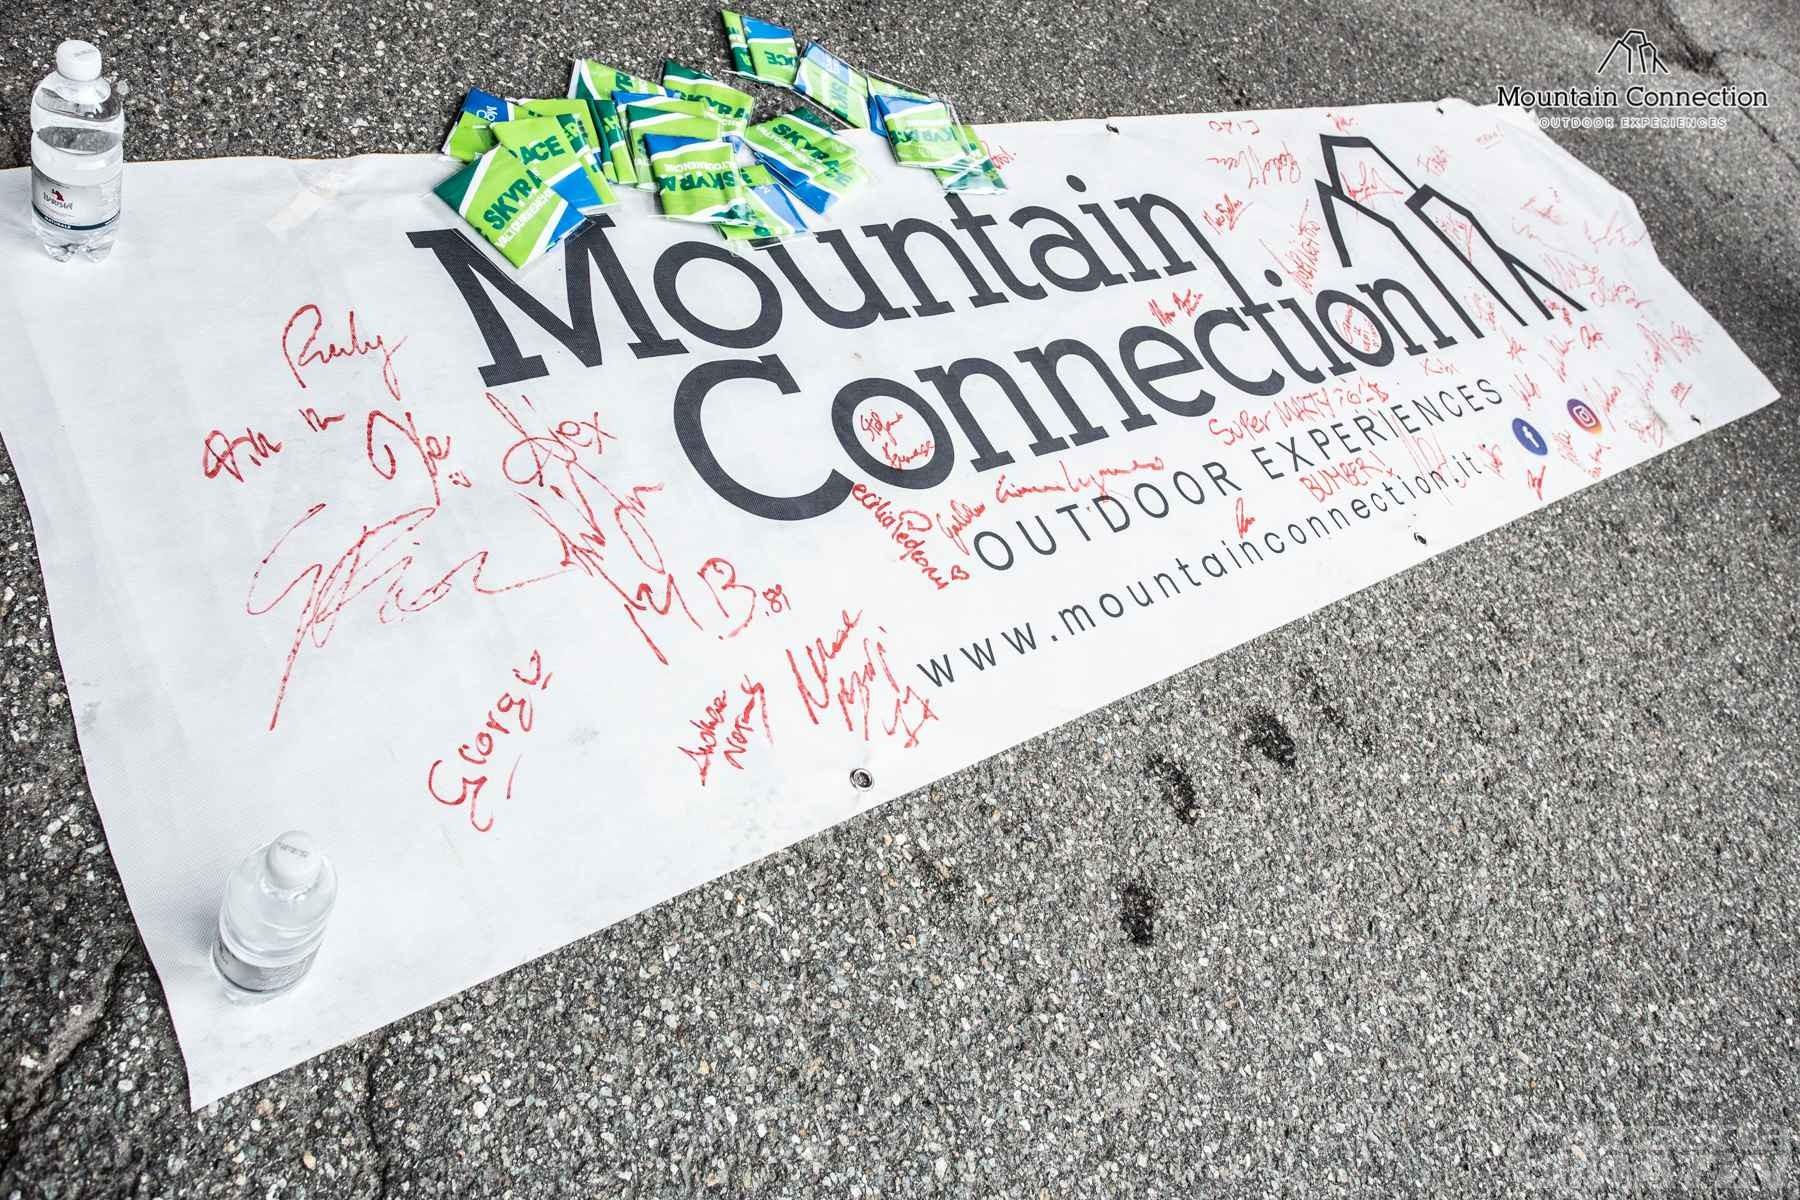 Trail: la MountainConnection Skyrace Valtournenche ad Alex Déjanaz e Fabiola Conti